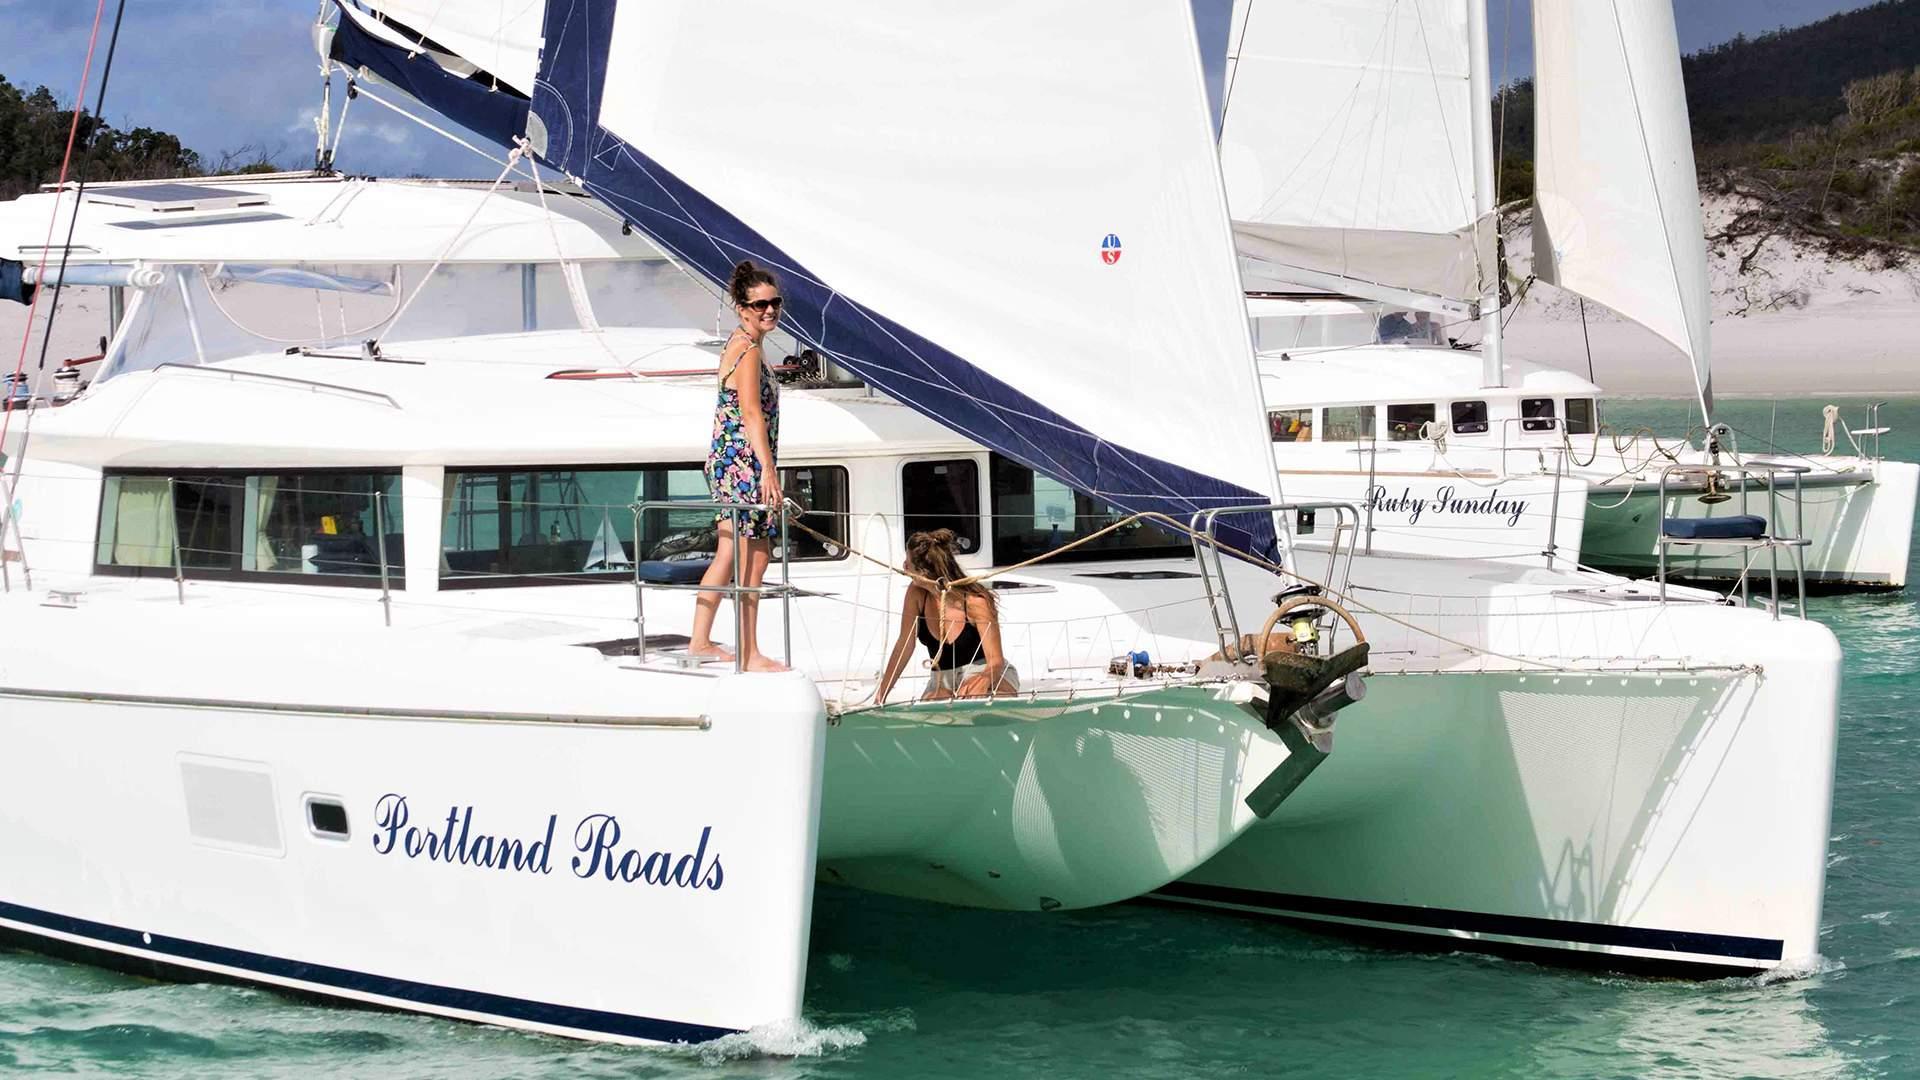 Portland Roads image 1 at Portland Roads – Sailing the Whitsundays by Whitsunday Regional, Queensland, Australia